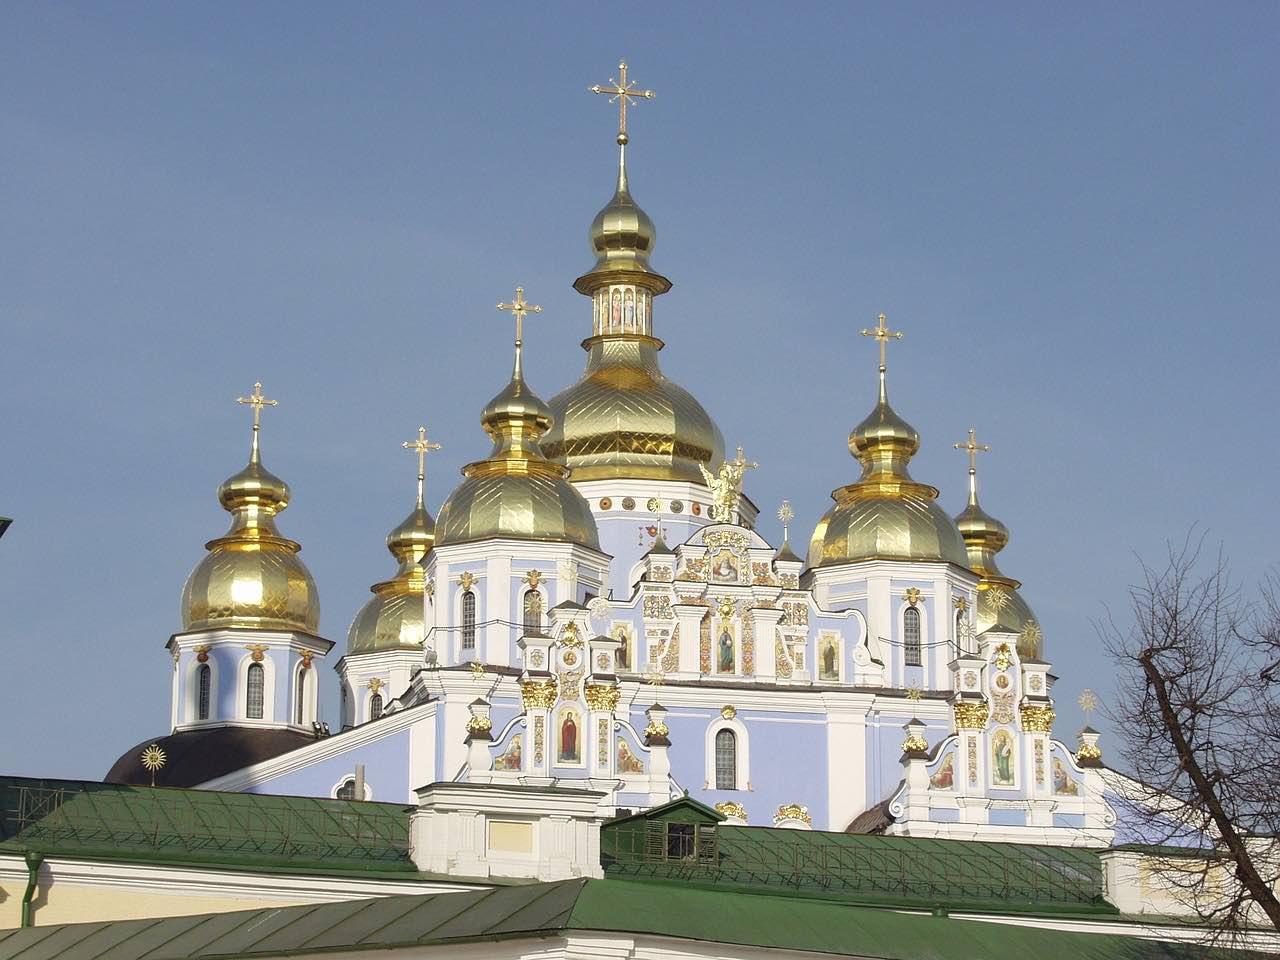 Kyiv-Pechersk Lavra Church Ukraine (Pixabay Free Image) - AspirantSG